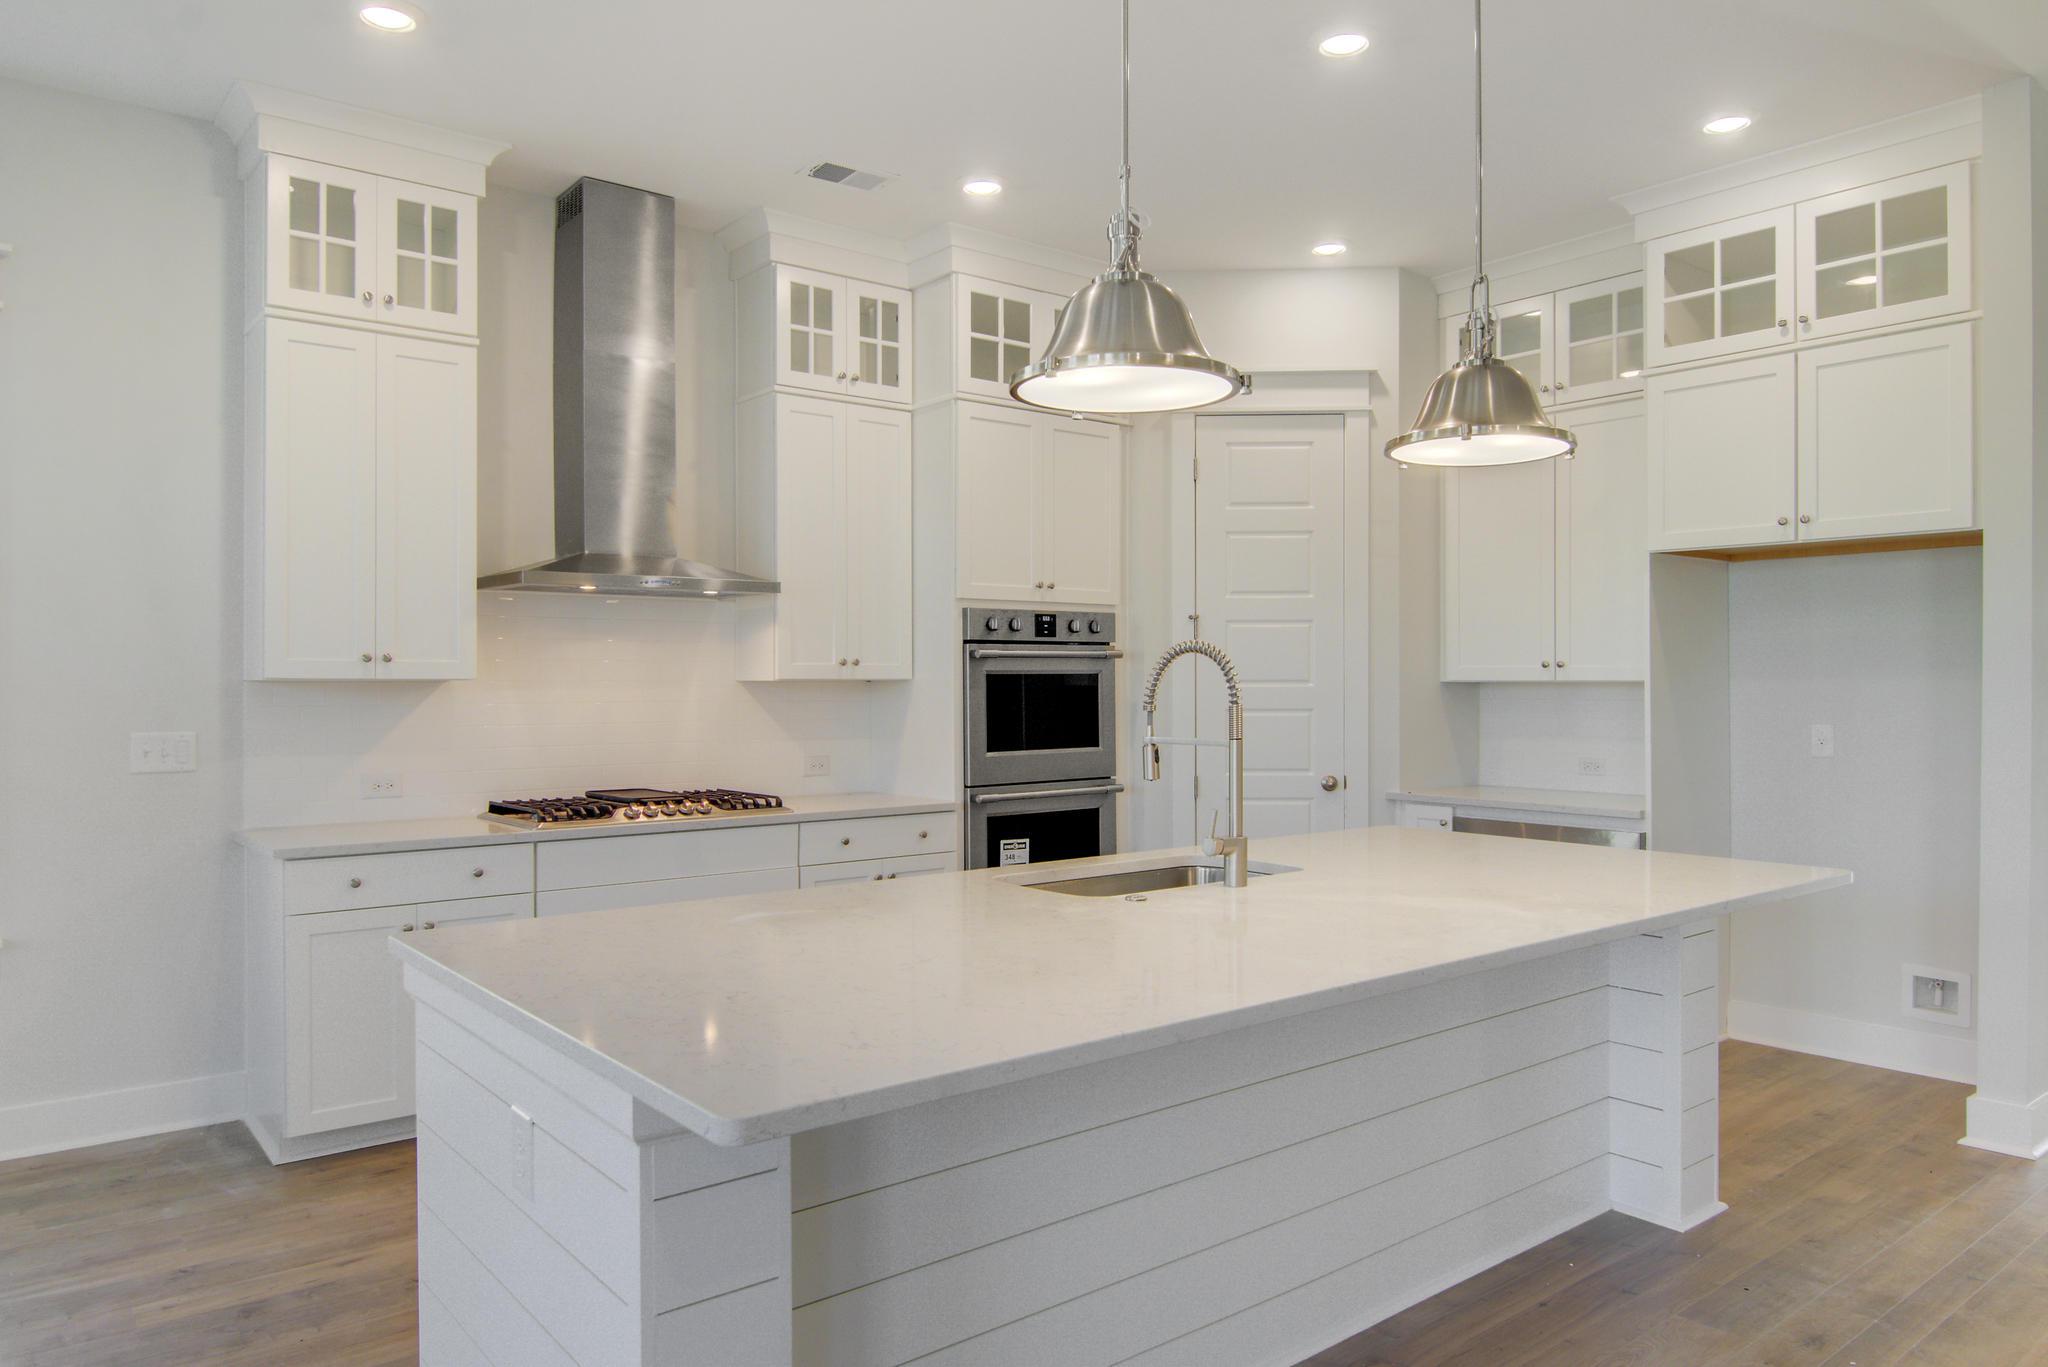 Carolina Park Homes For Sale - 1734 Sandy Brook, Mount Pleasant, SC - 11